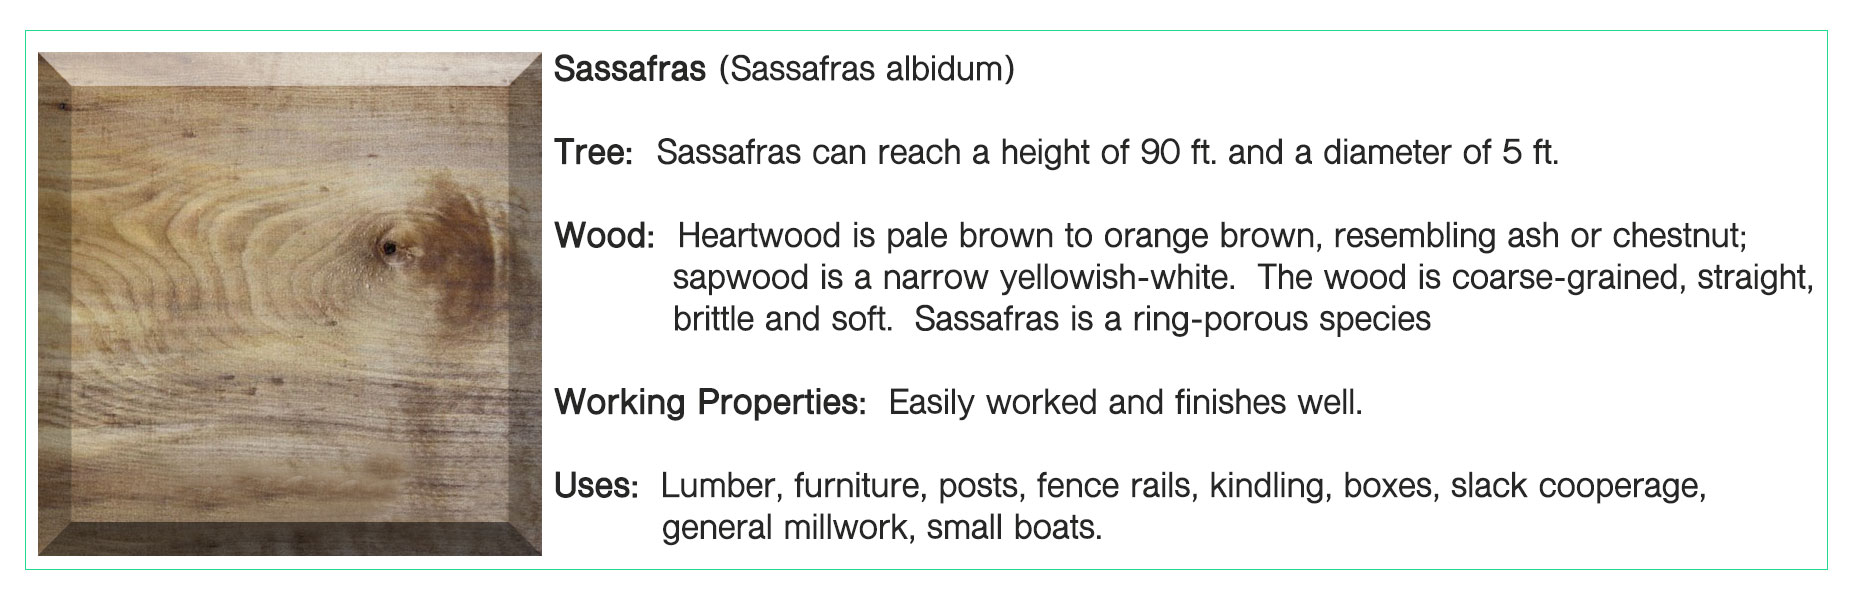 Sassafras-.jpg